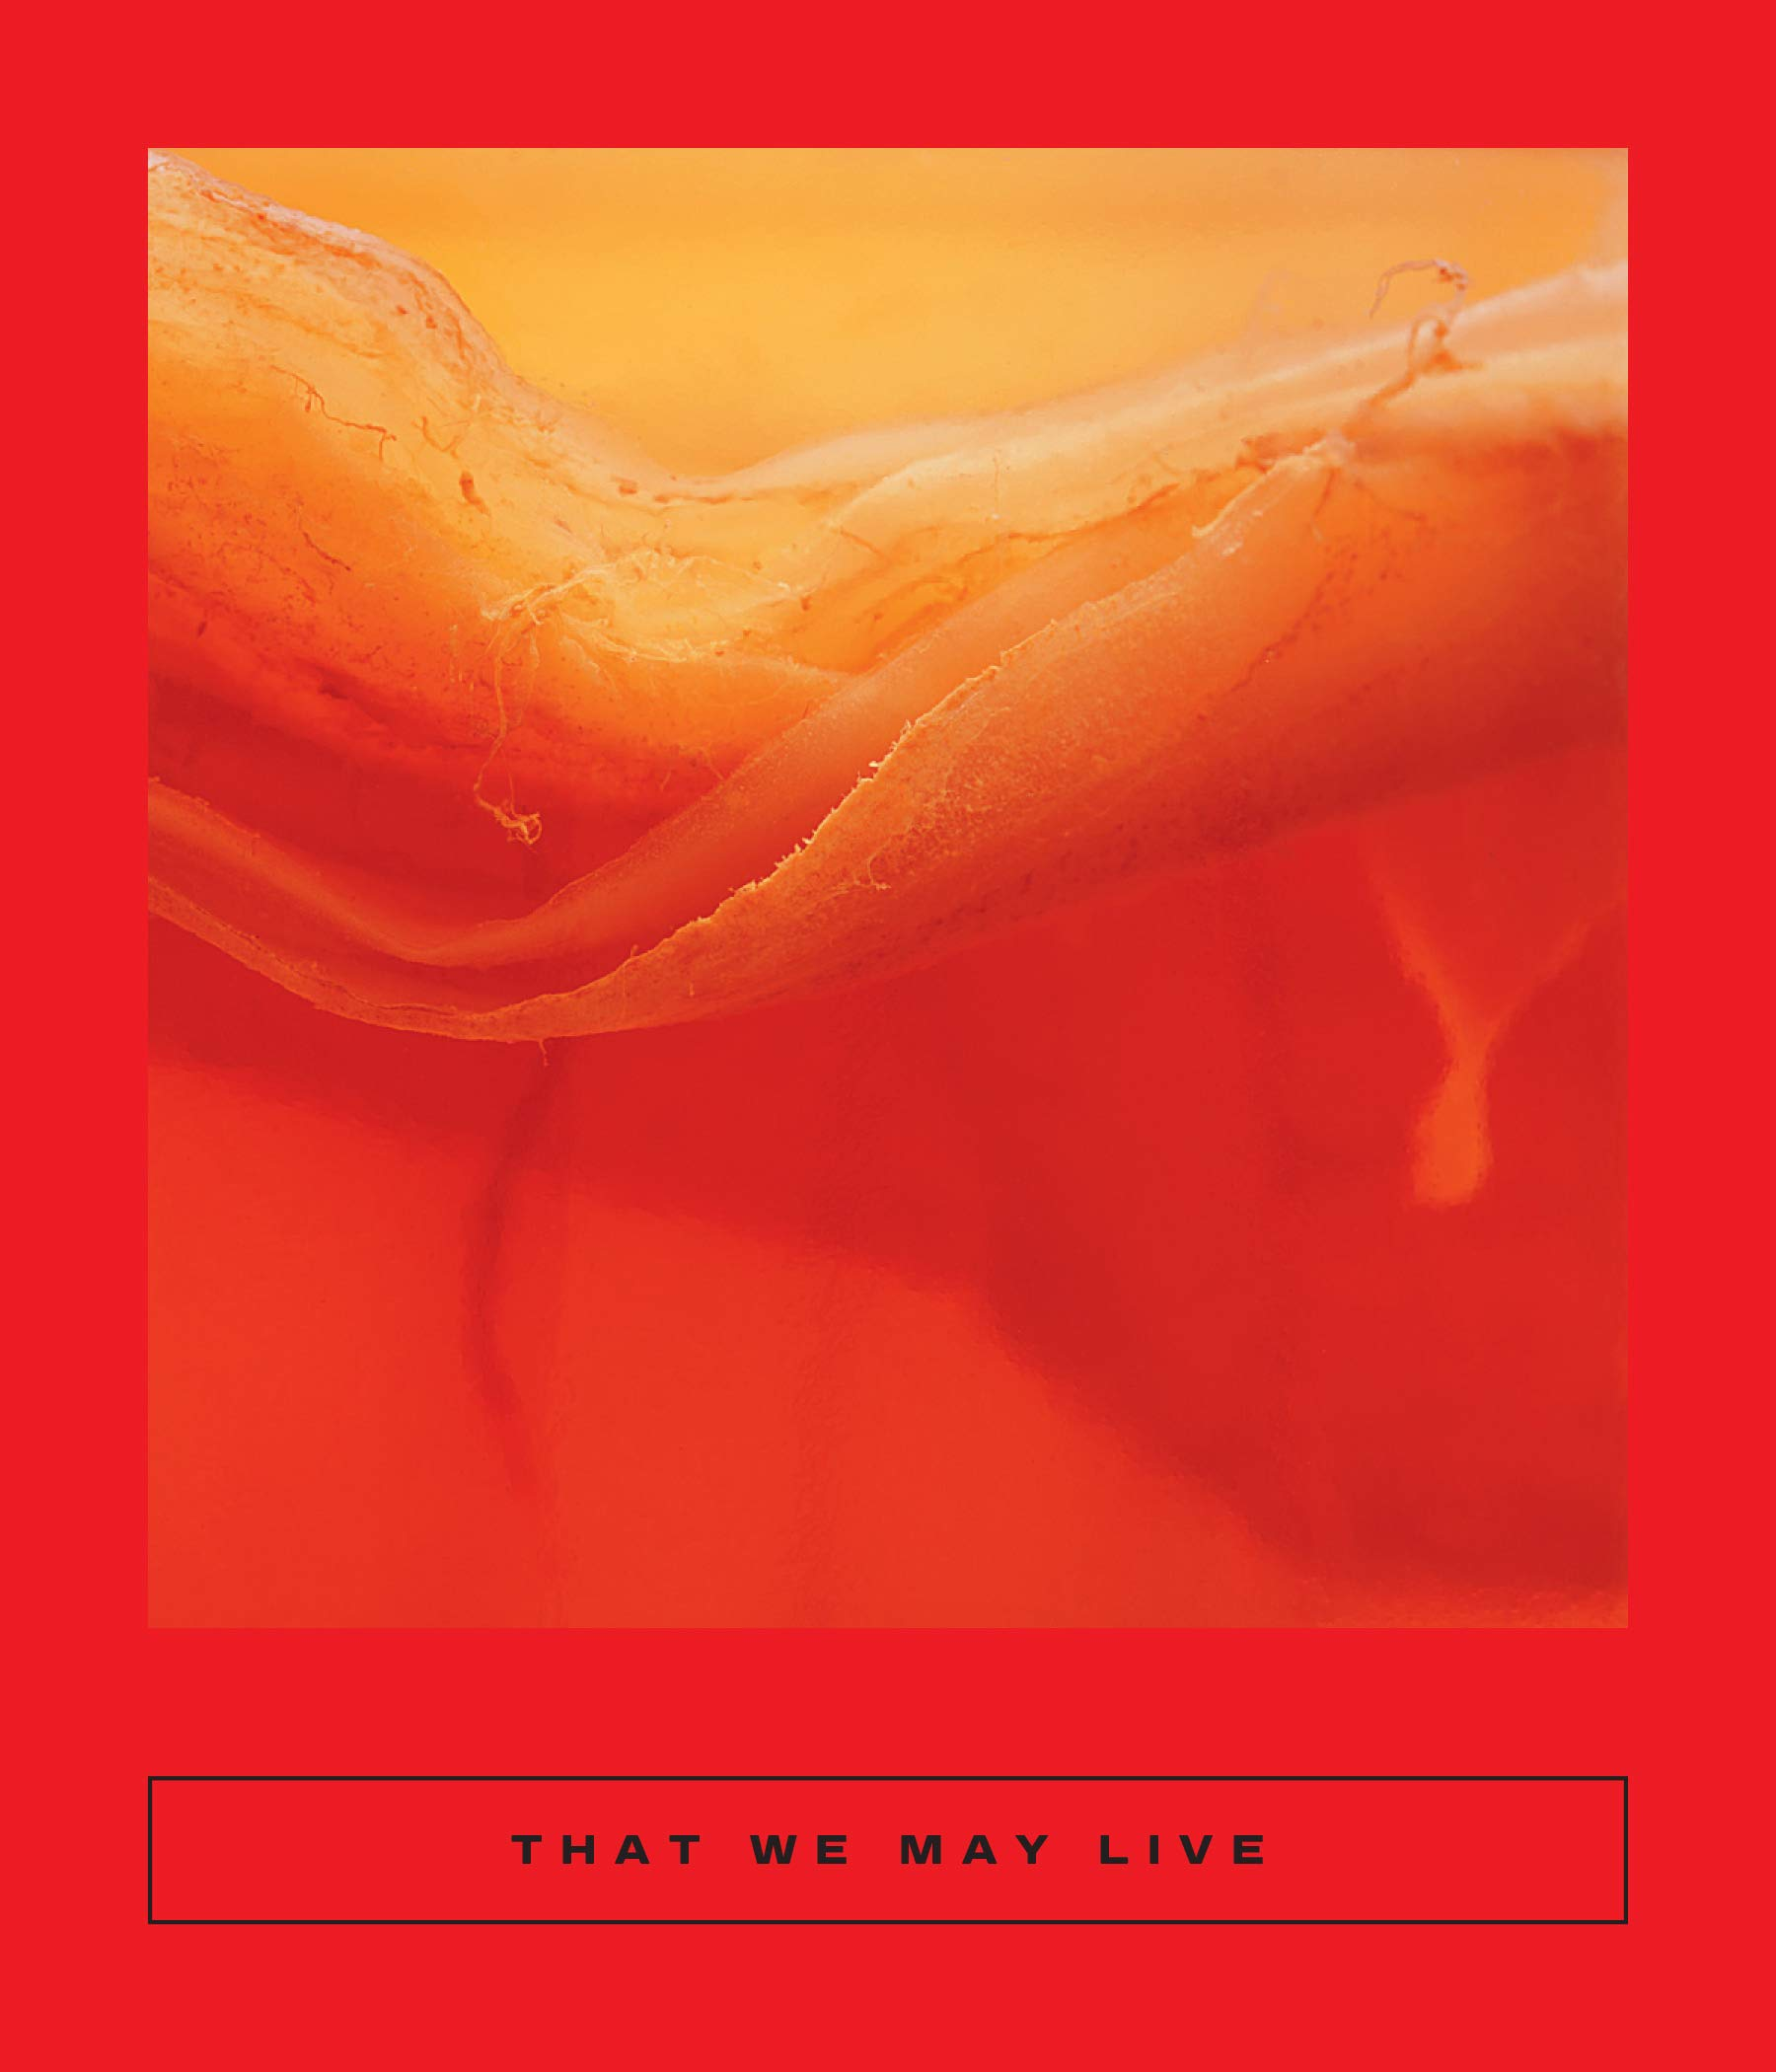 That We May Live: Speculative Chinese Fiction (Calico, 1): Yan, Ge, Tse,  Dorothy, Wa, Chan Chi, Chen, Si'an, Tam, Enoch, Zhu, Hui, Evans, CJ,  Coolidge, Sarah: 9781949641004: Amazon.com: Books